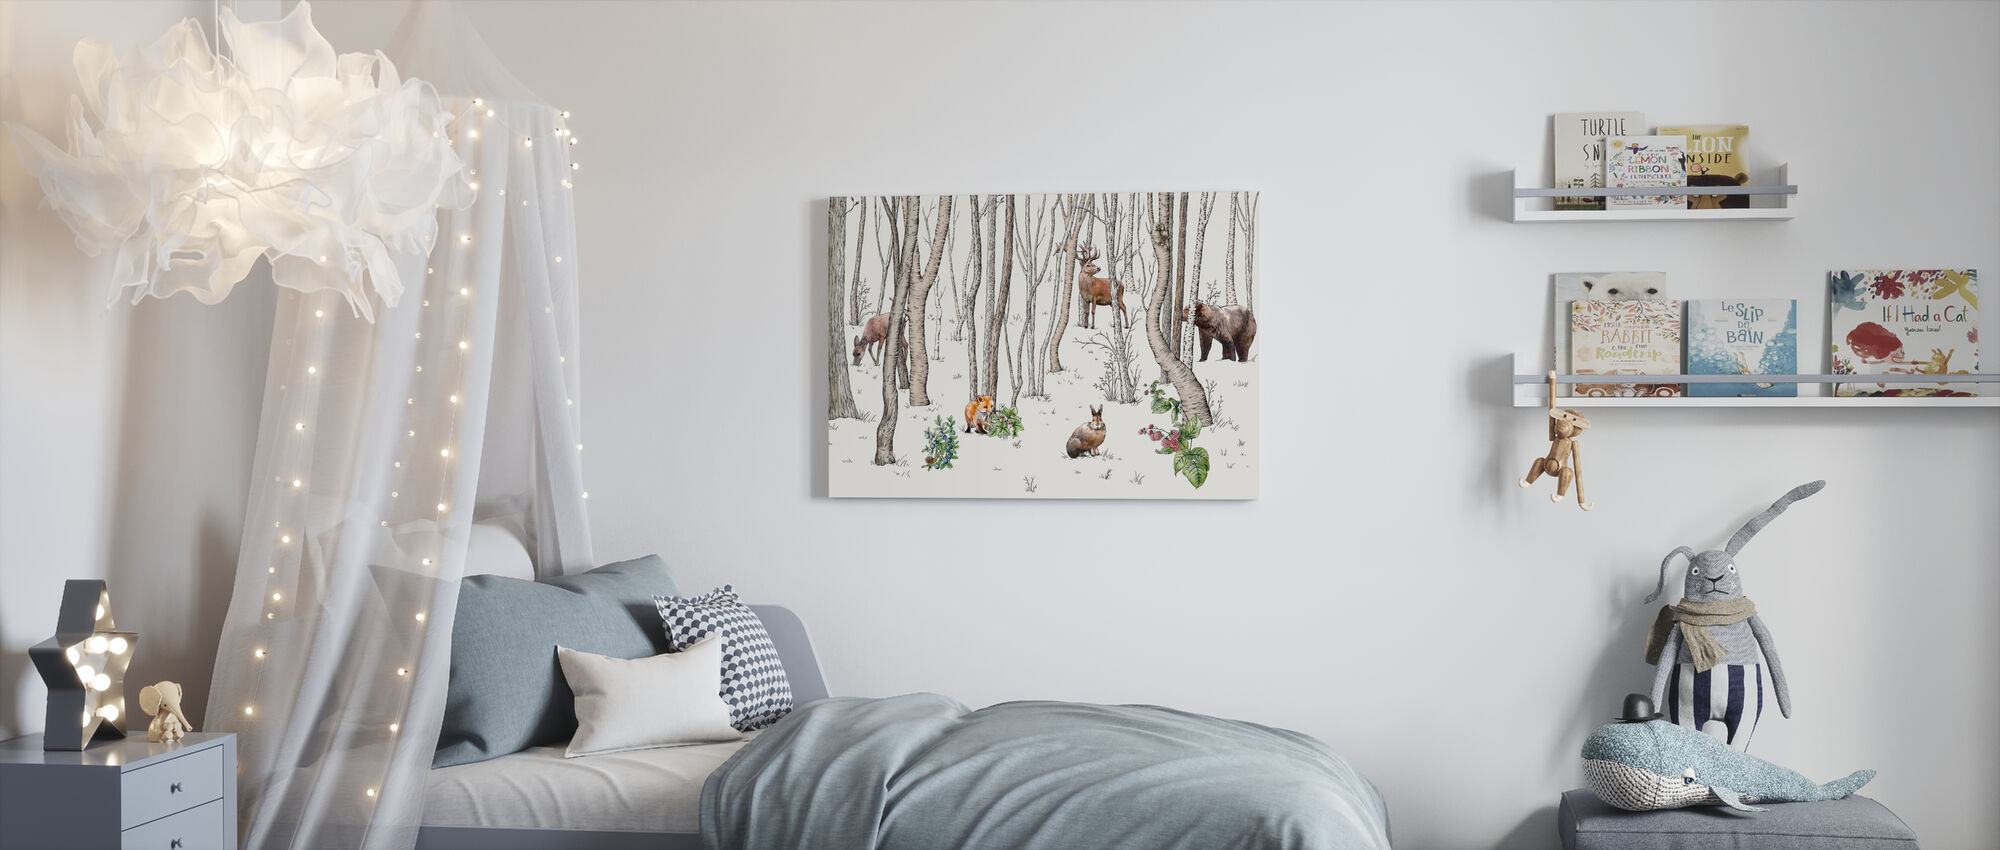 Skogens dyr - Lerretsbilde - Barnerom